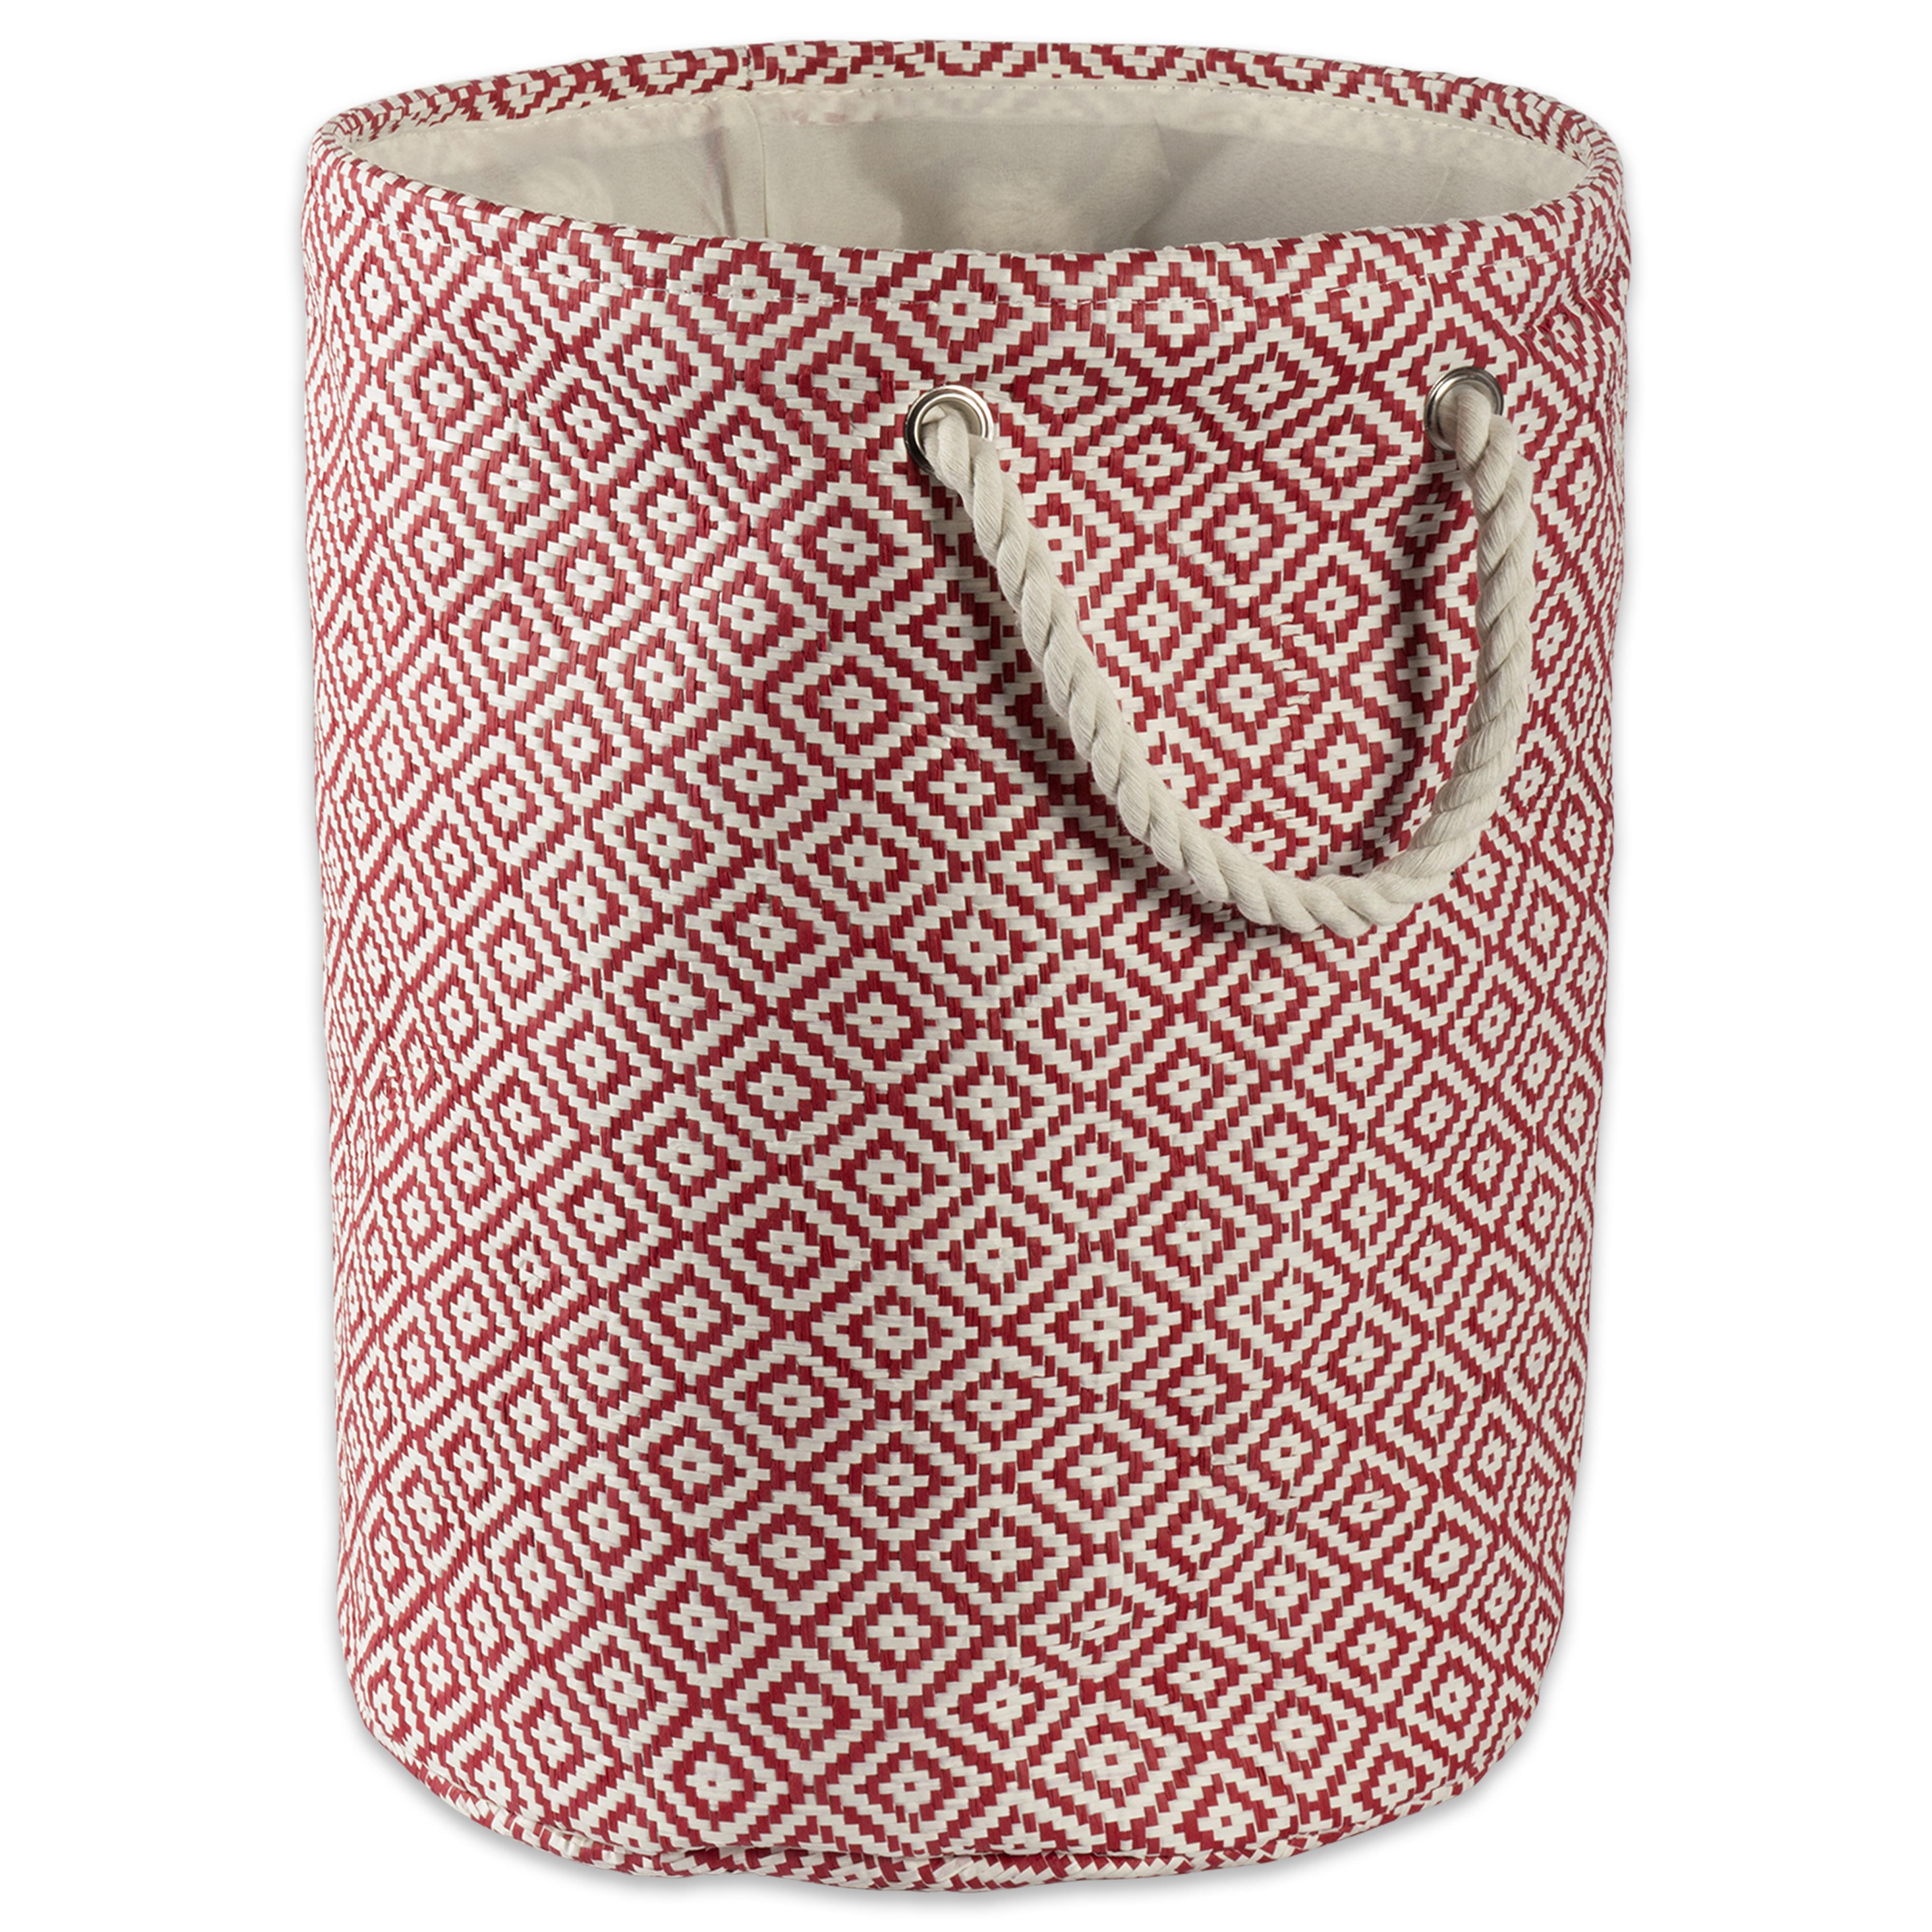 "Design Imports Paper Bin Geo Diamond Rust Round Small, 14""x14""x12"", 100% Natural Woven Paper, Red"